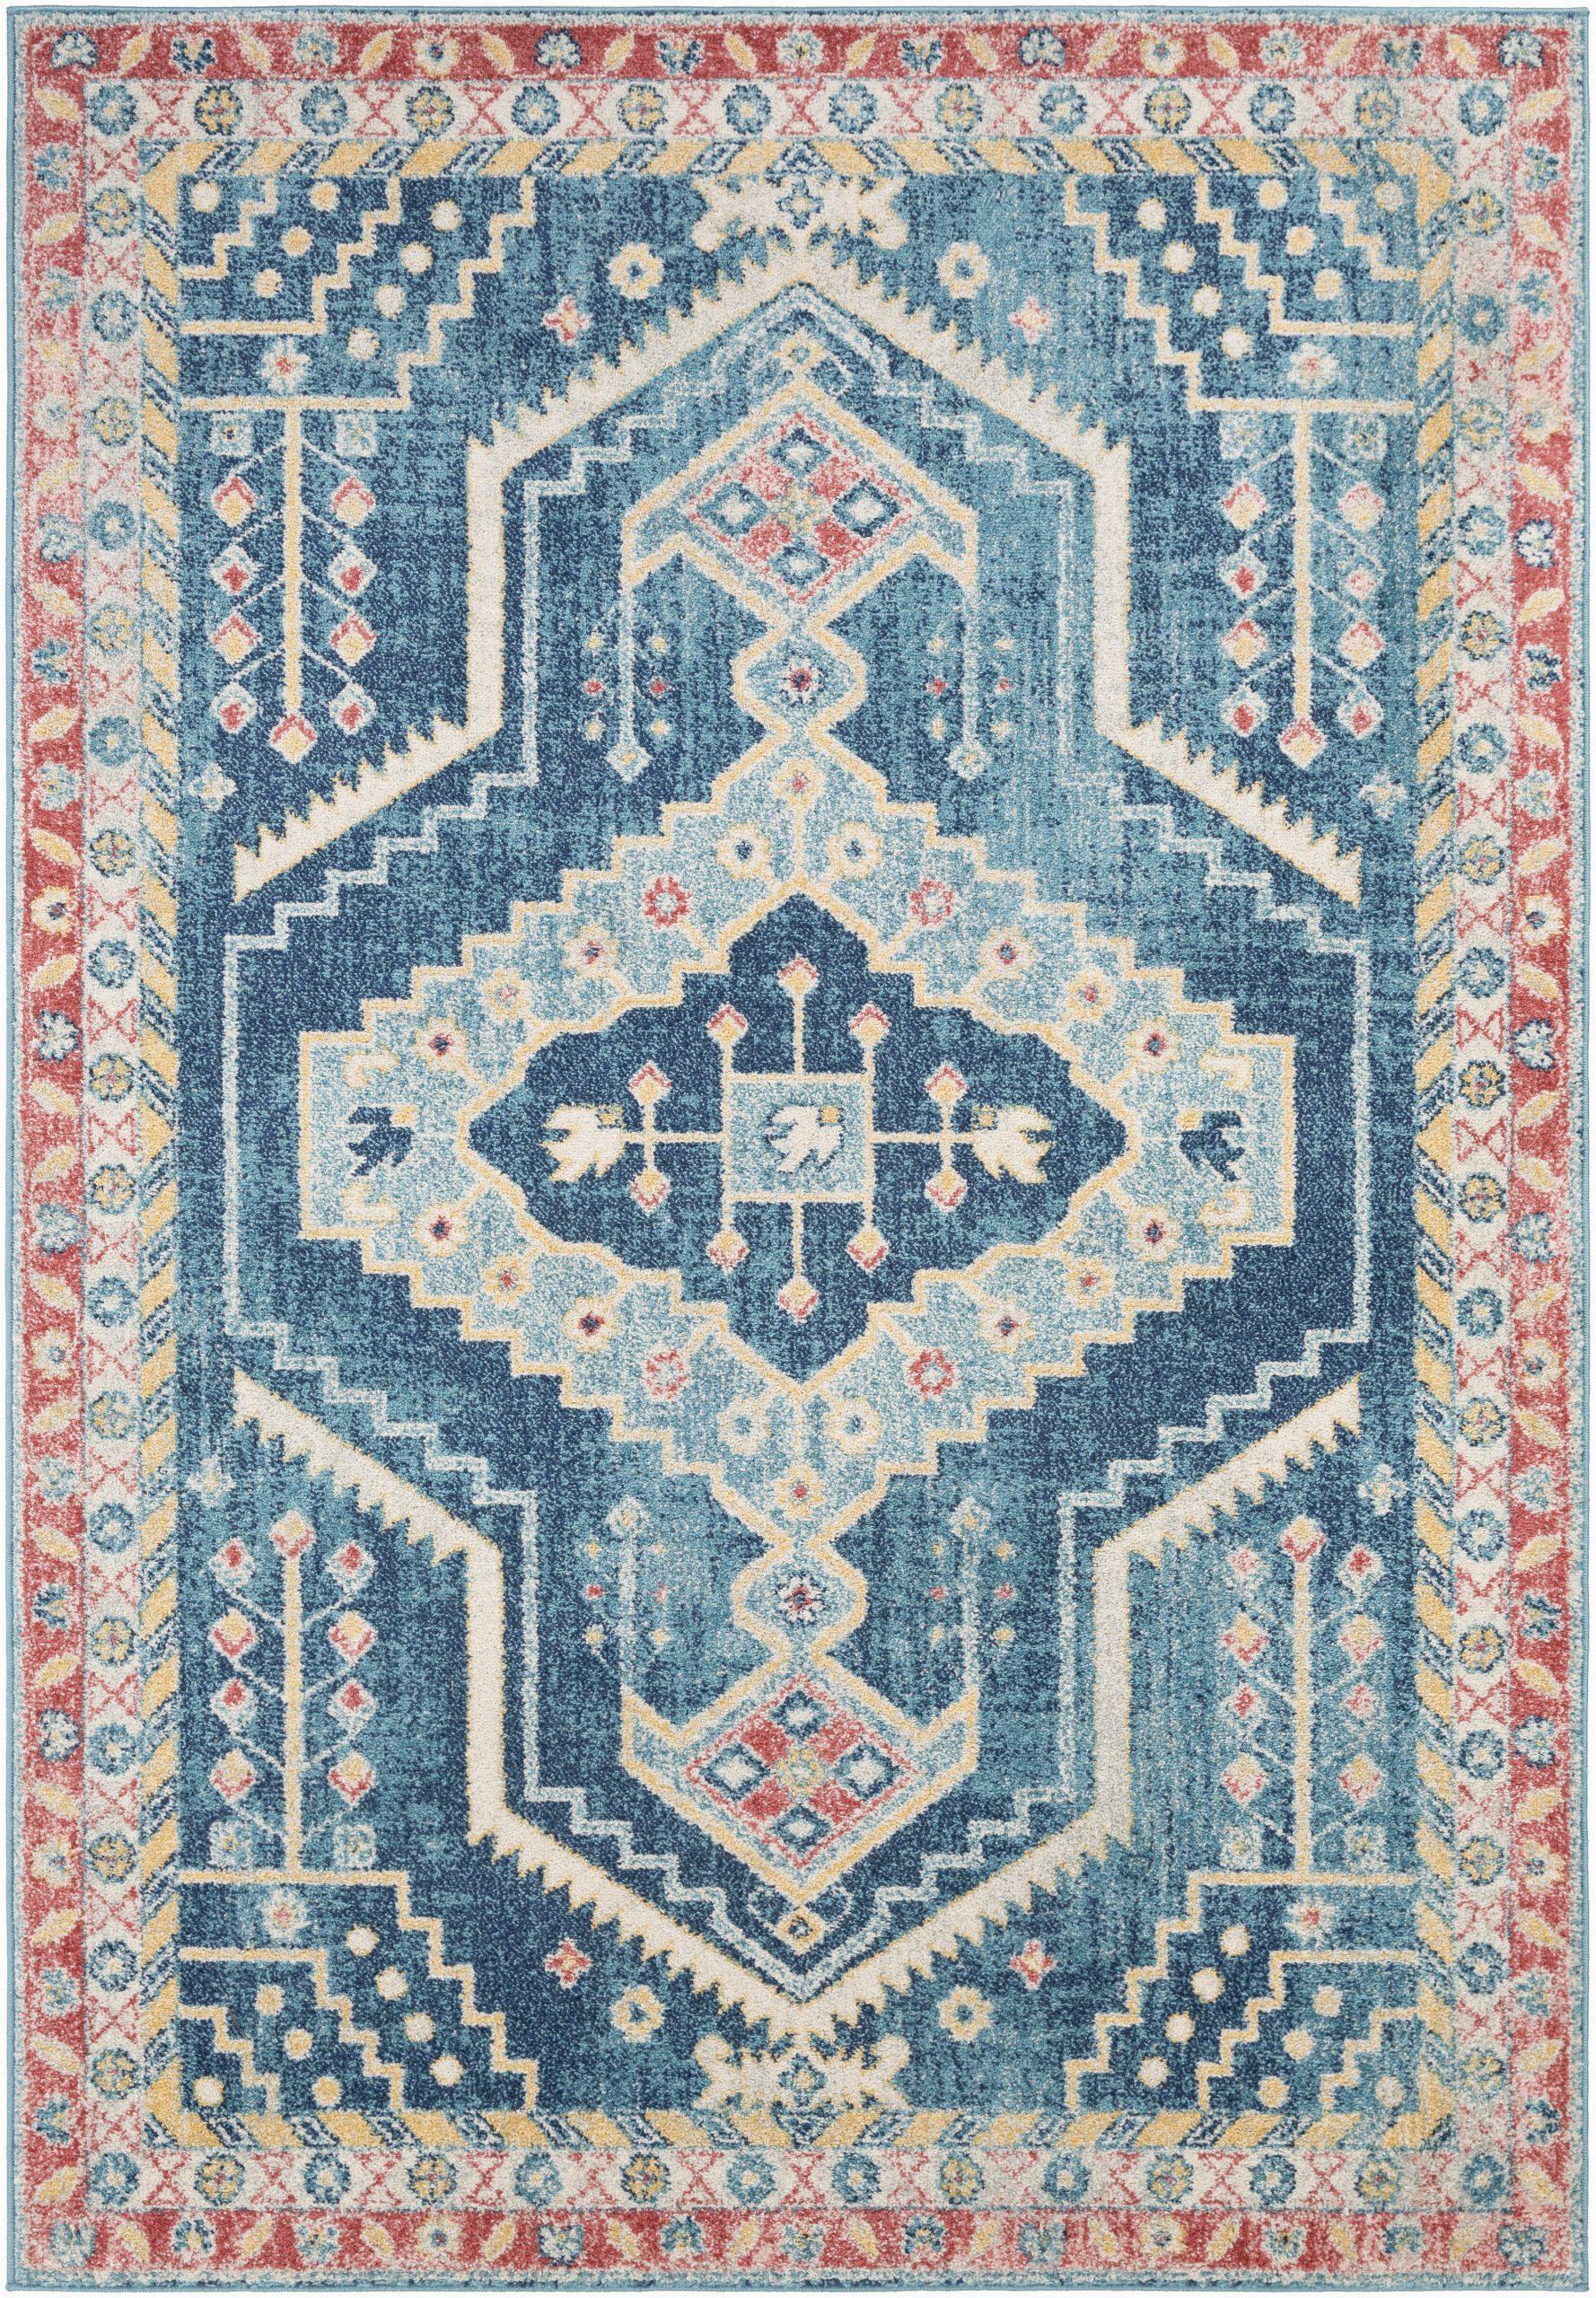 bilaal oriental sky blue area rug